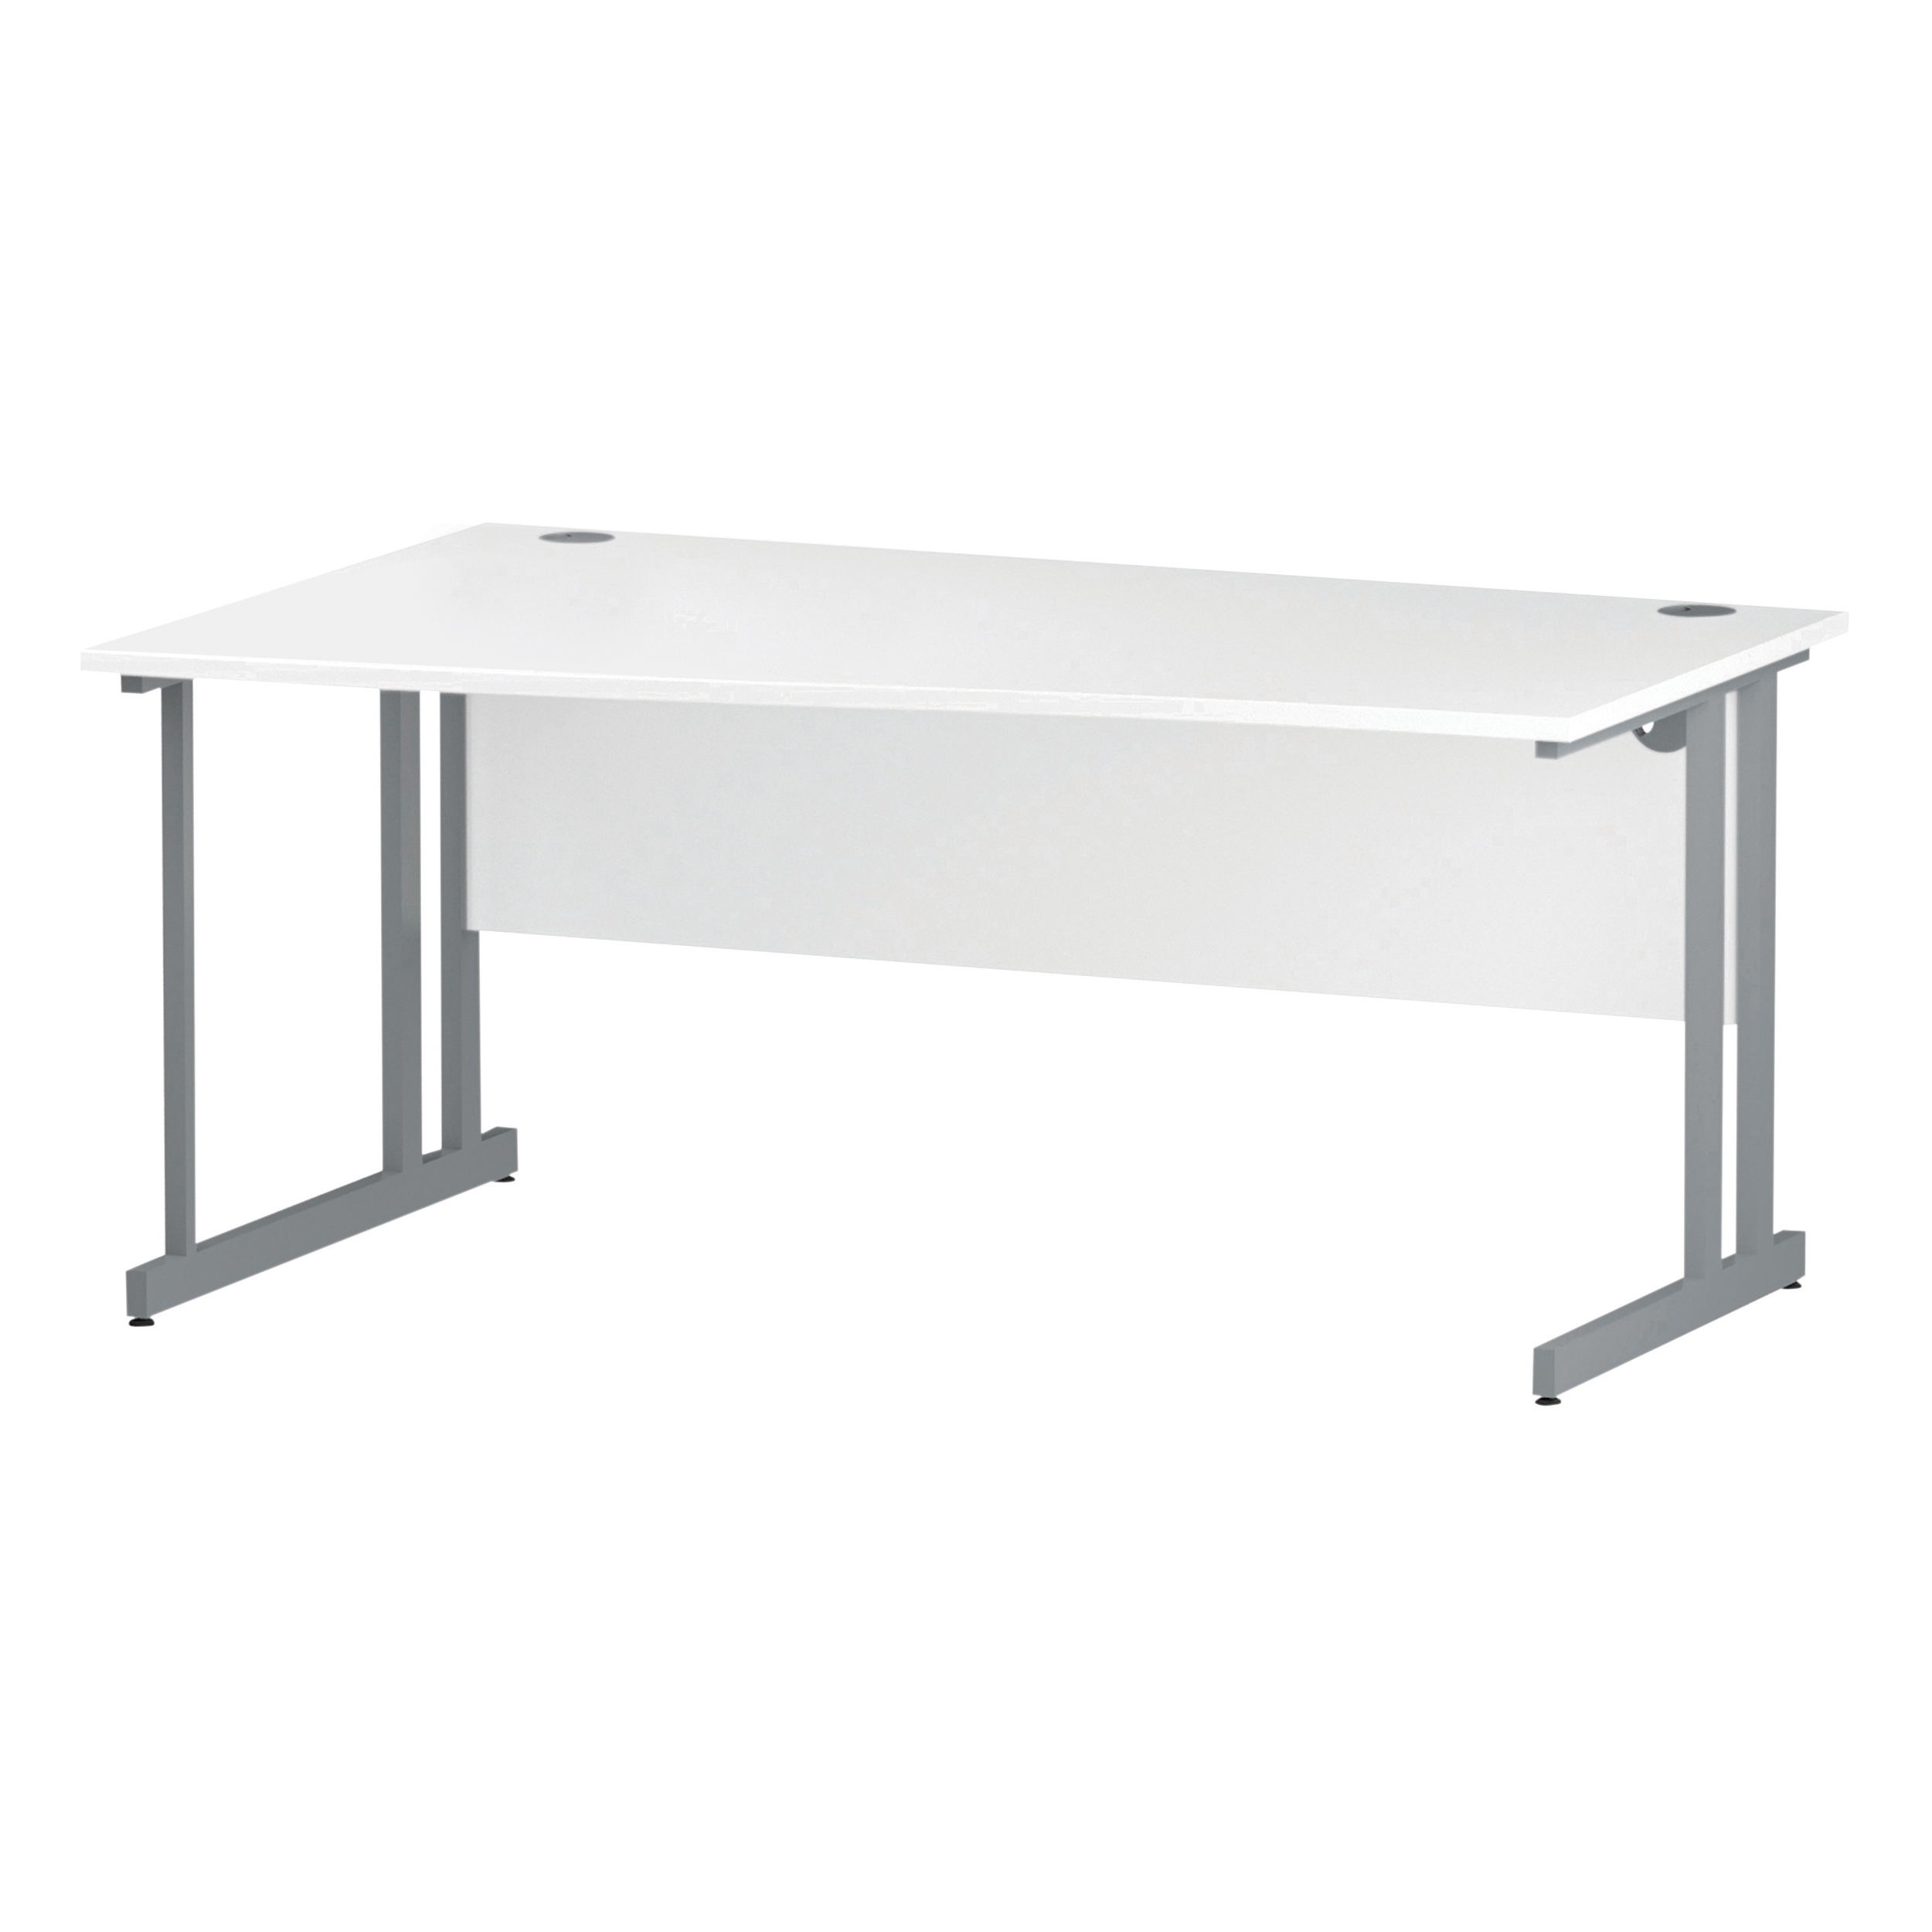 Trexus Wave Desk Left Hand Silver Cantilever Leg 1600mm White Ref I000311